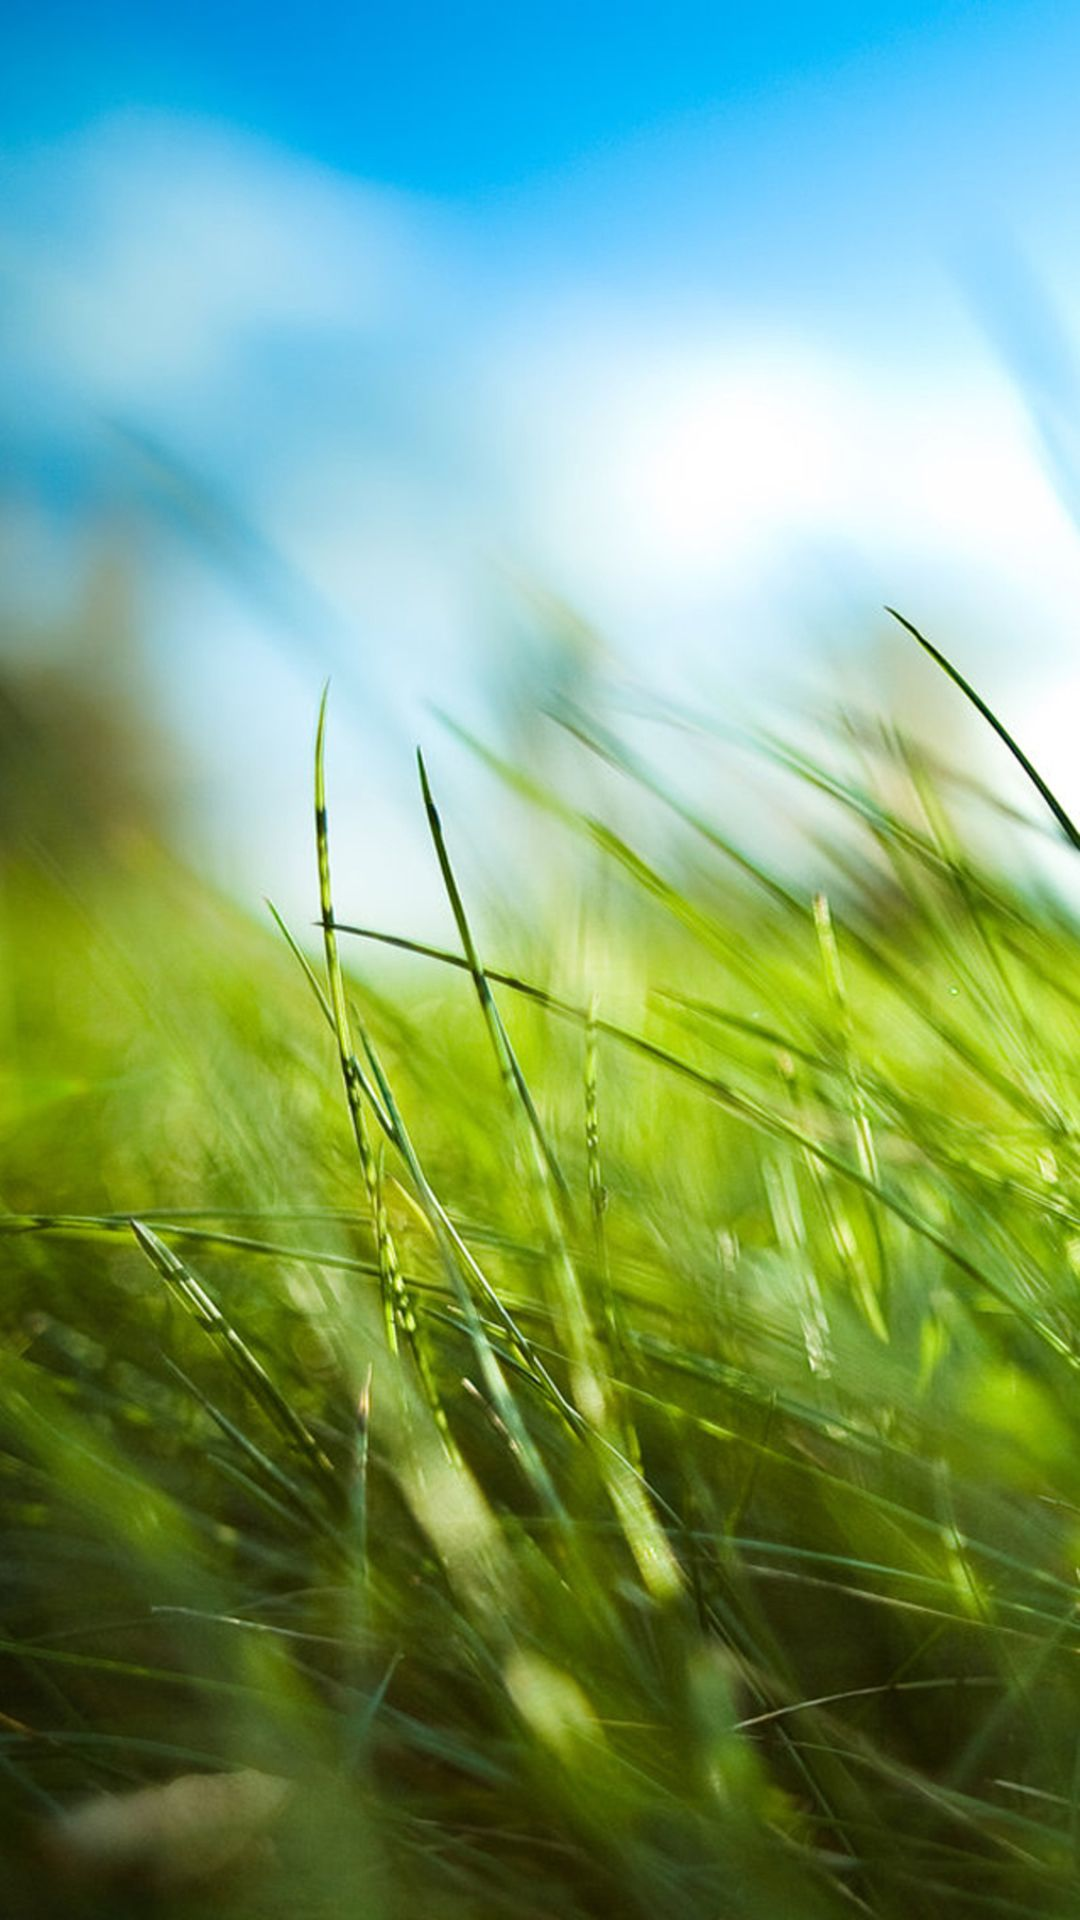 Wallpaper iphone hd retina - Nature Sunny Blue Sku Green Grassland Field Iphone 6 Plus Wallpaper